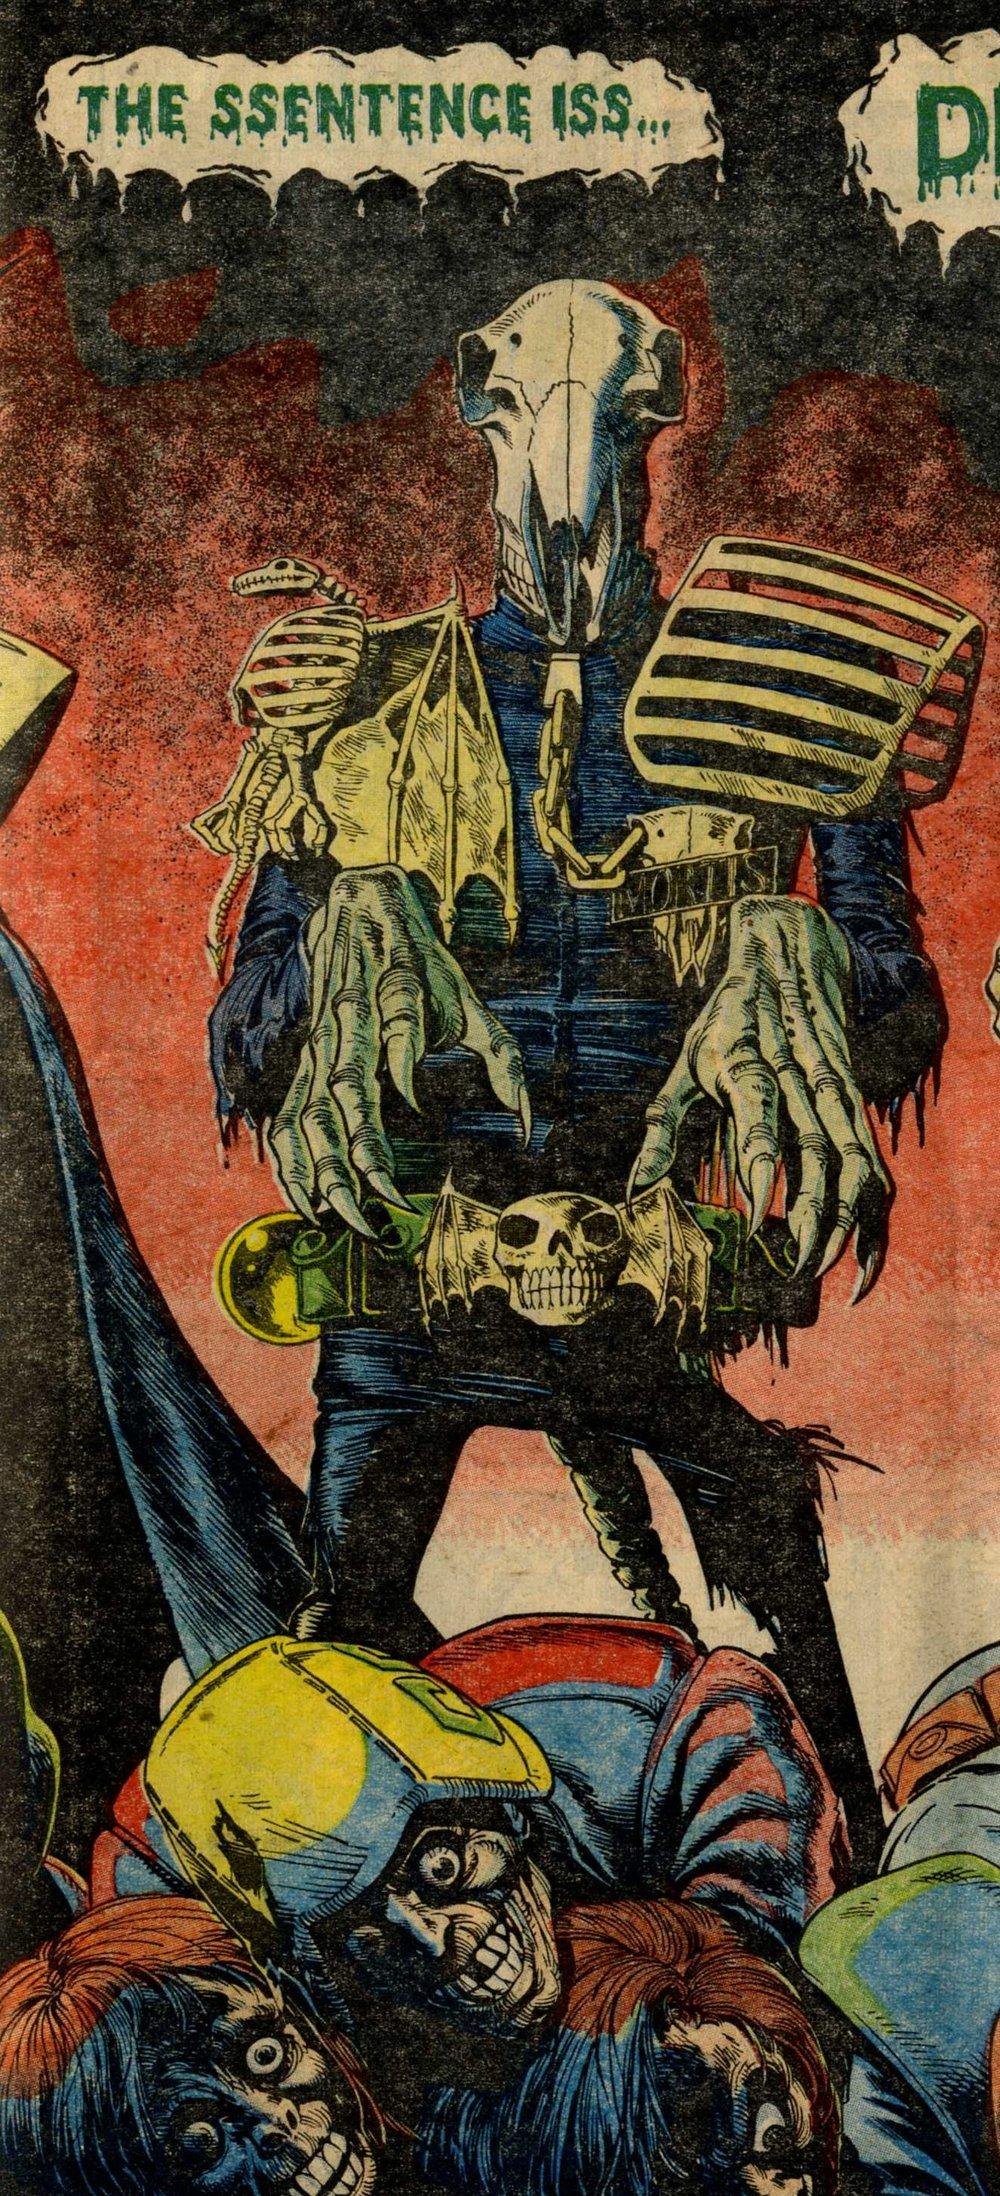 Judge Mortis, drawn by Brian Bolland